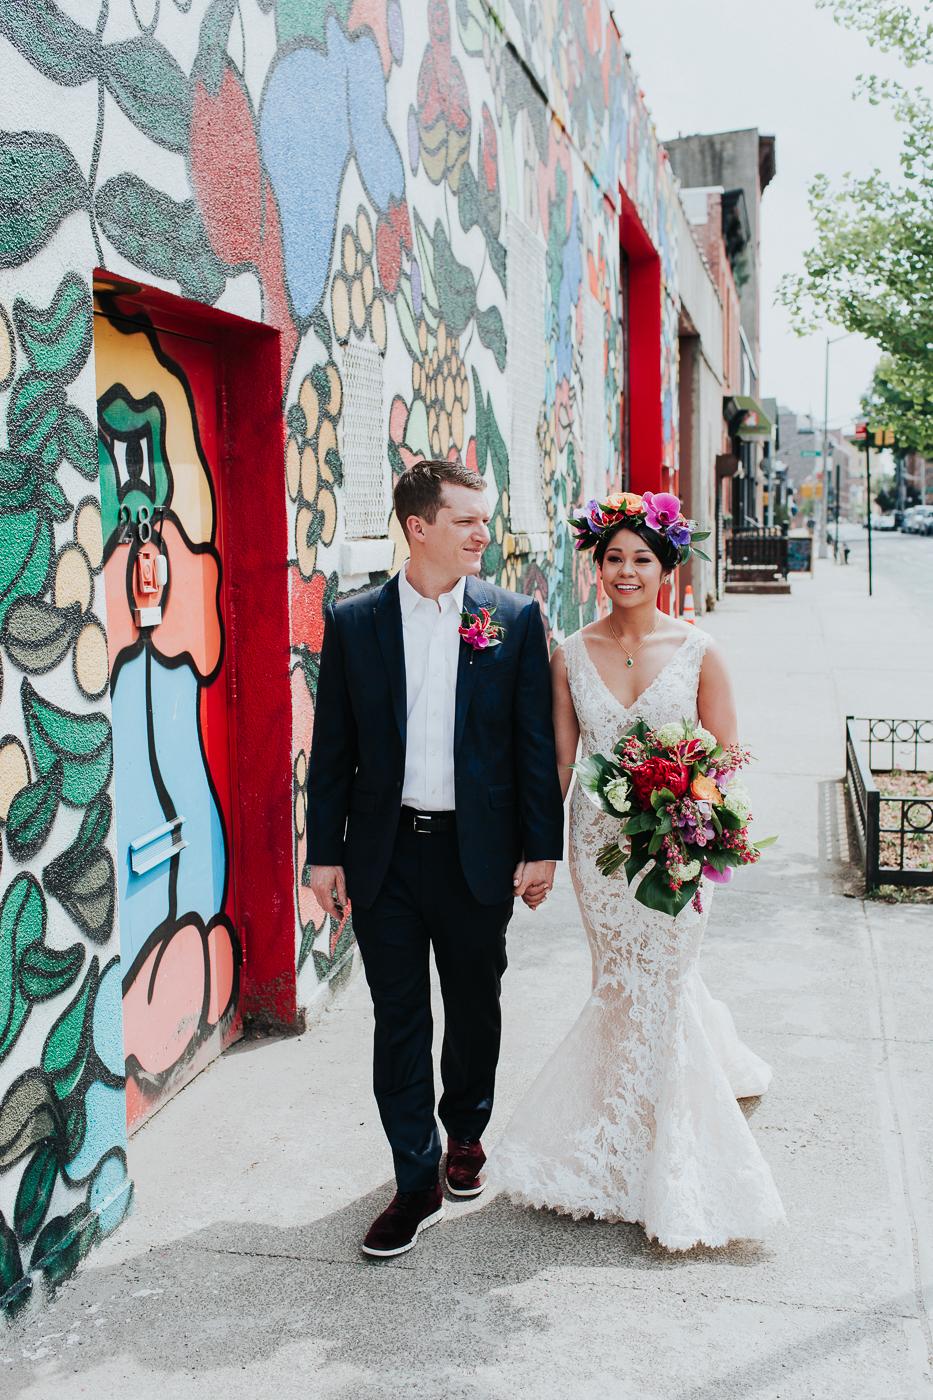 501-Union-Brooklyn-Documentary-Wedding-Photographer-36.jpg